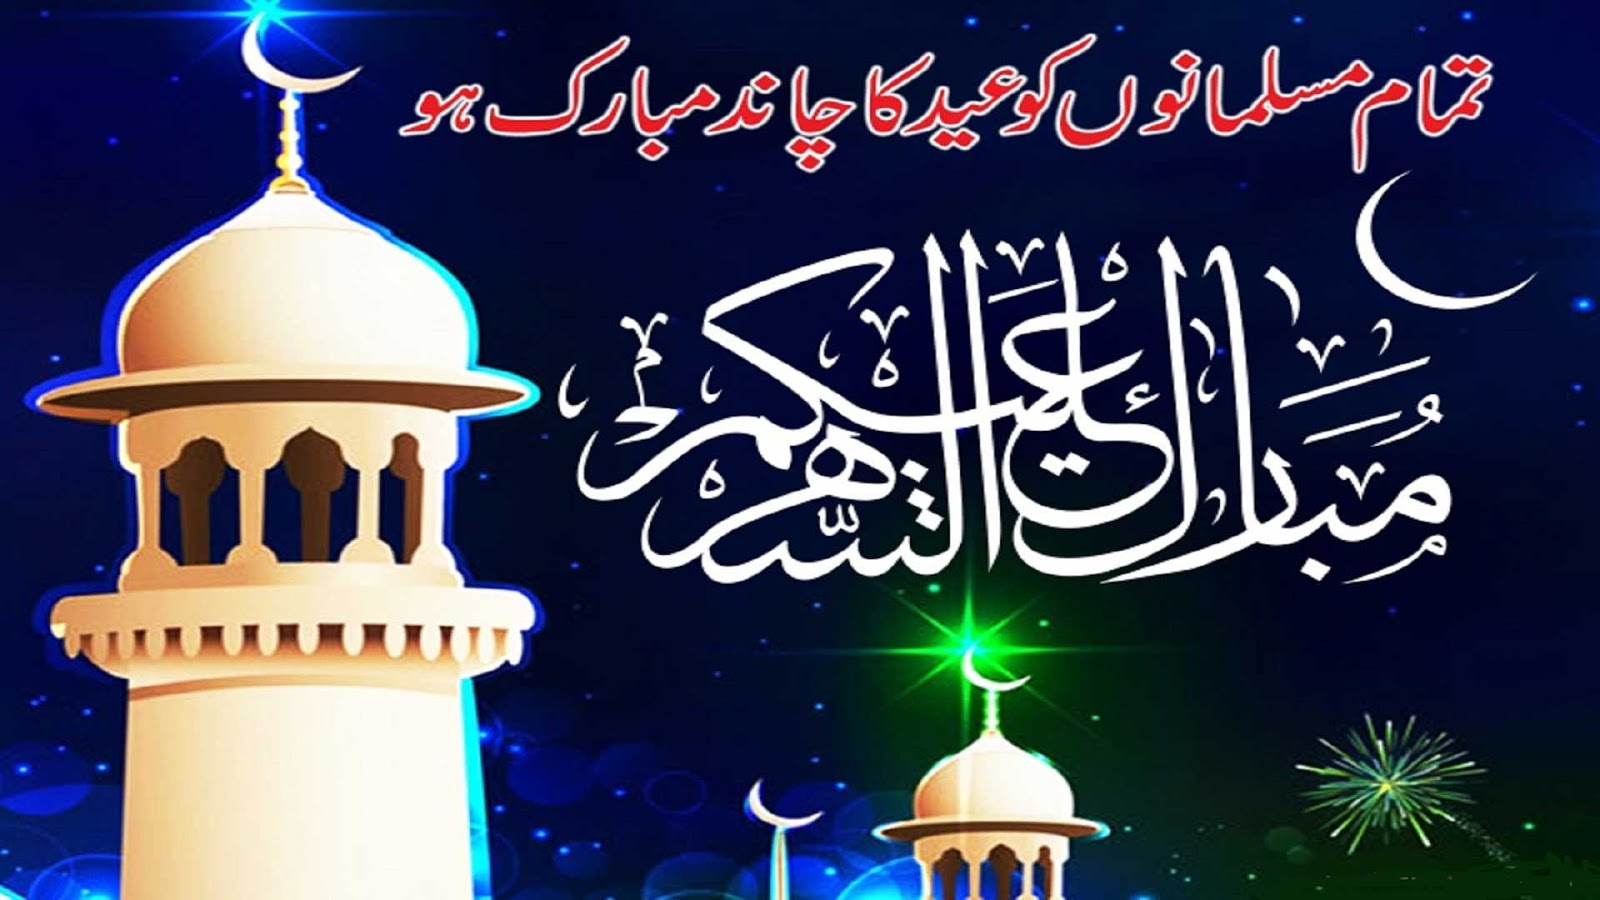 Ramadan Mubarak Wallpaper In Urdu Happy Ramadan Eid Muba...